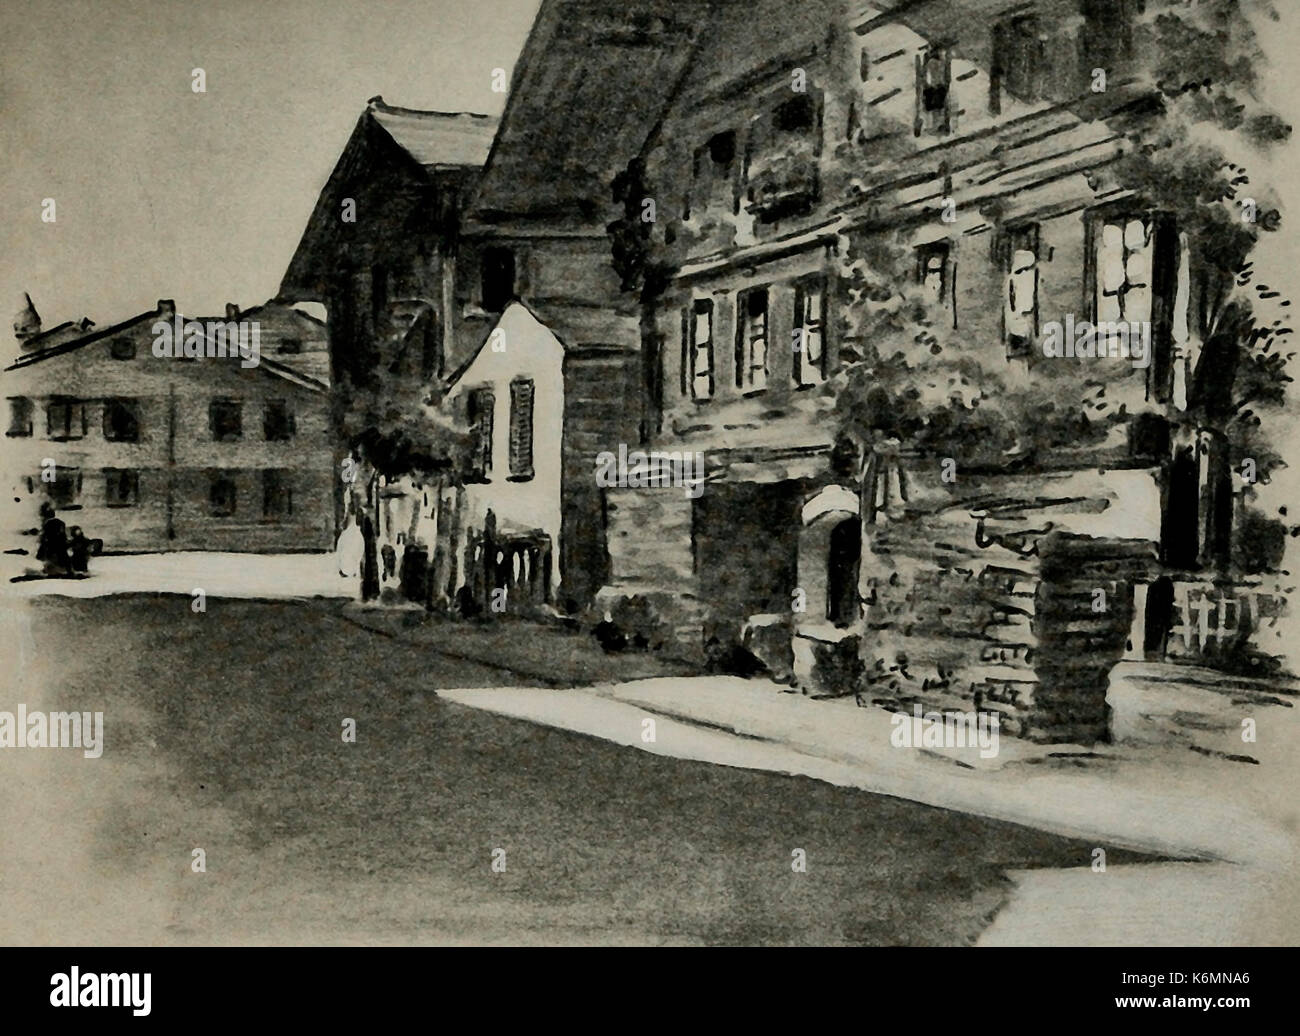 Interlaken, Switzerland, circa 1900 - Stock Image